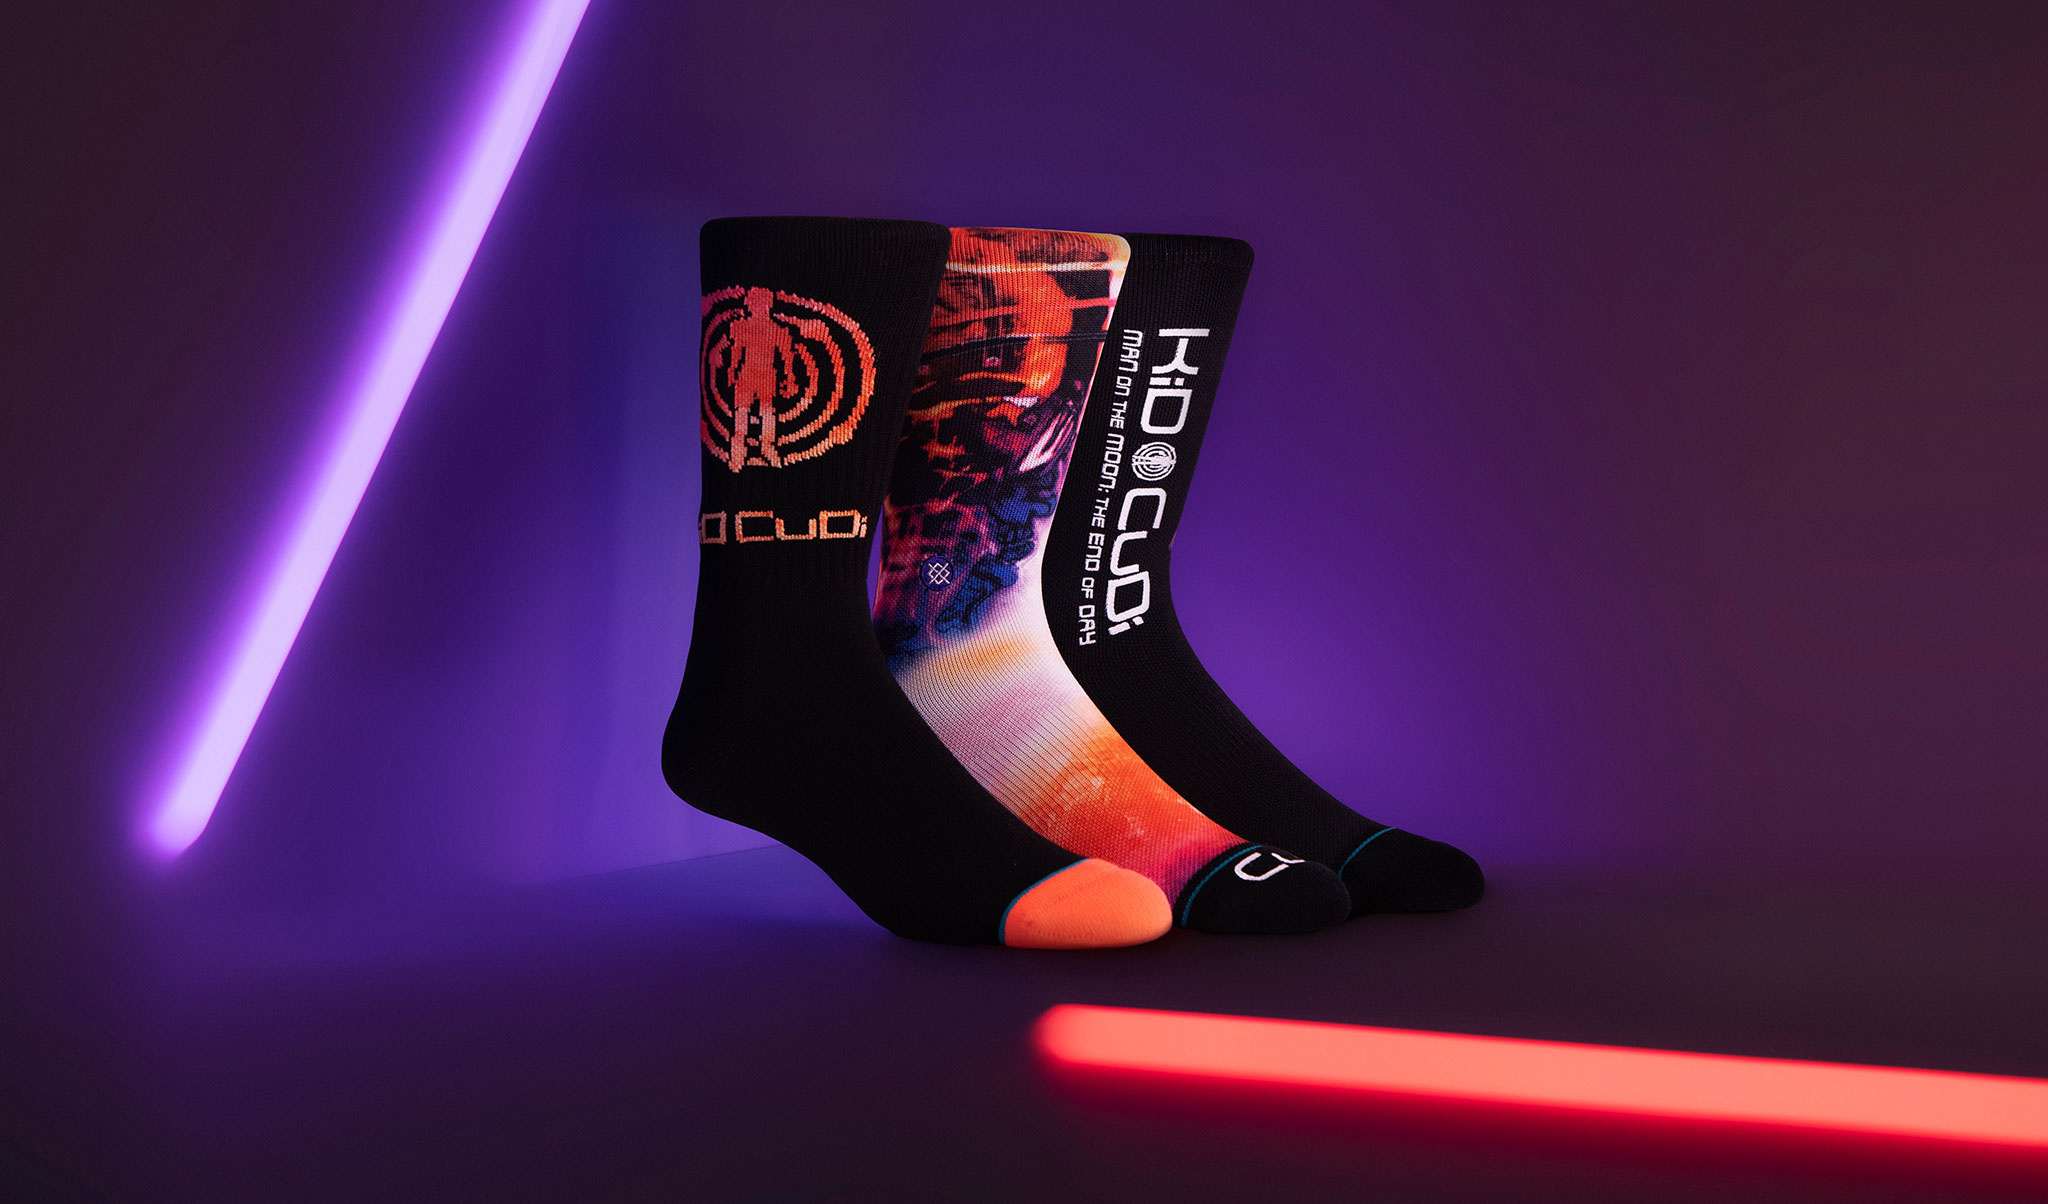 Release: Stance X Kid Cudi Socks